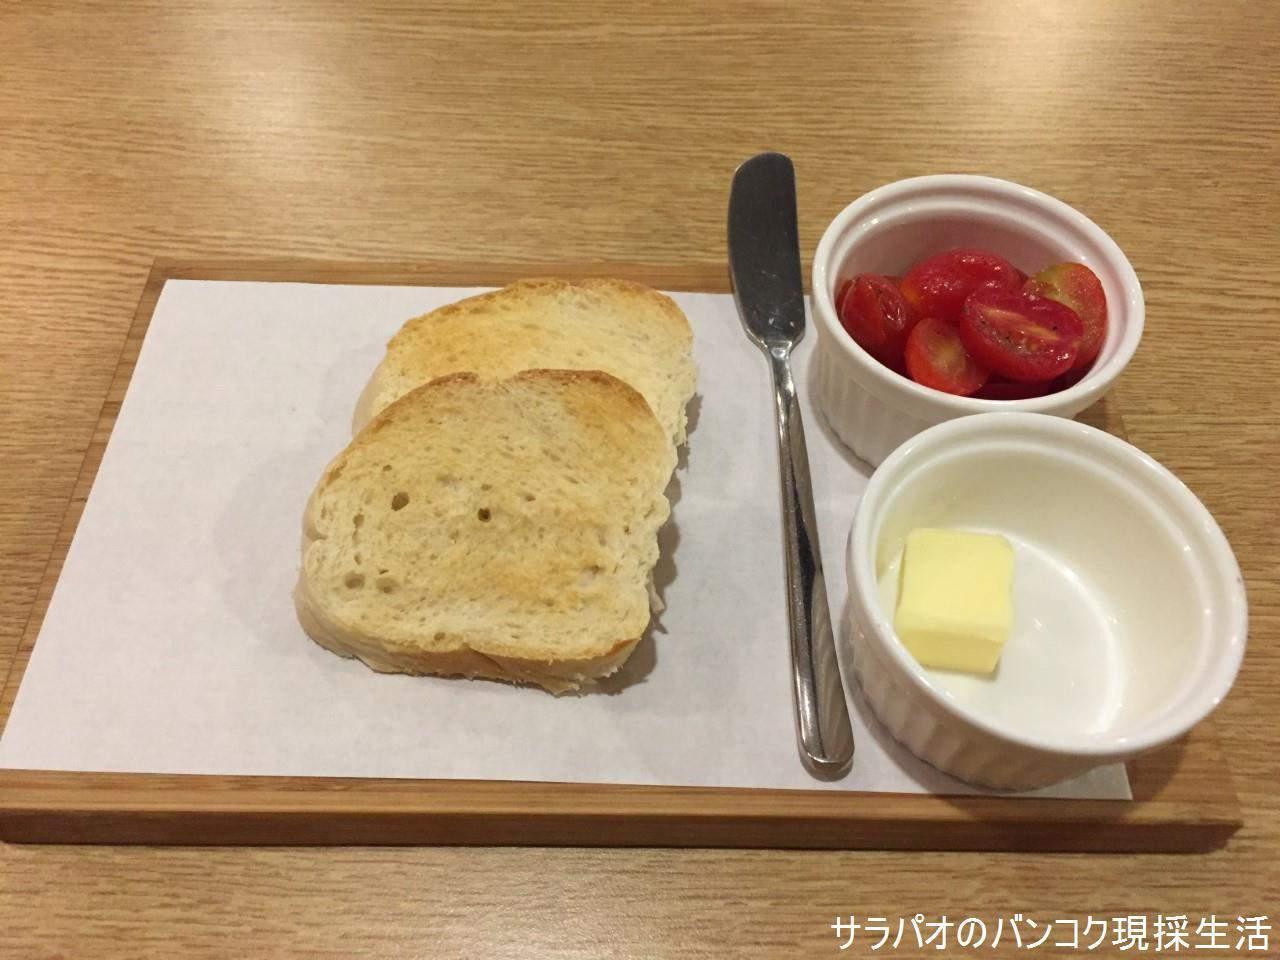 Wata_11.jpg